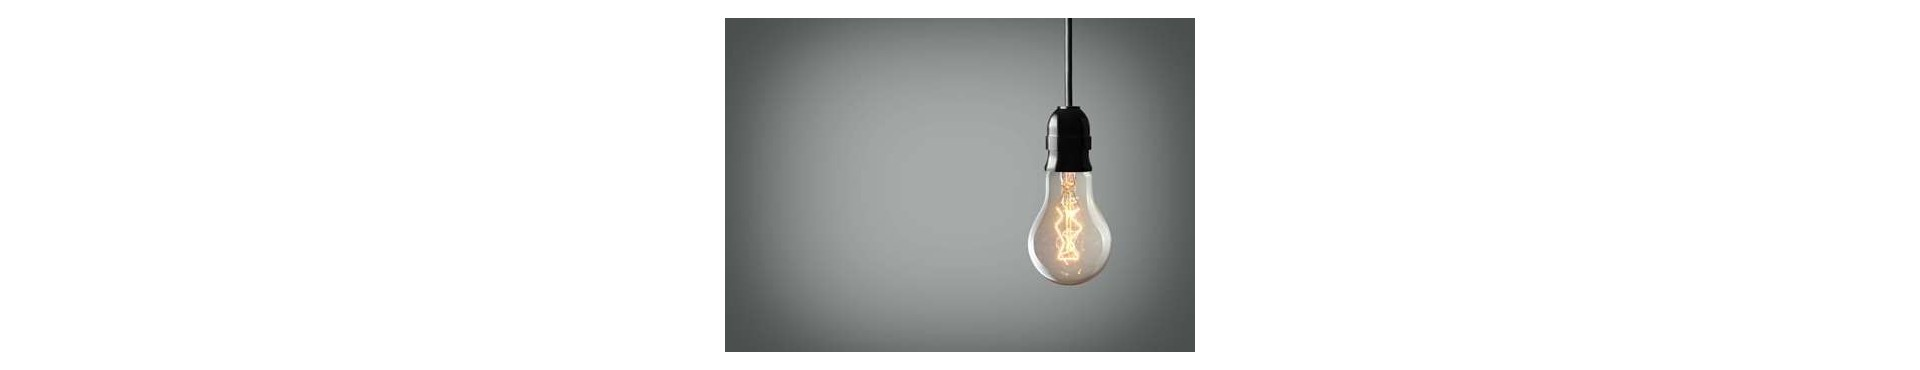 Lumière wifi Tuya Smartlife Alexa Google home